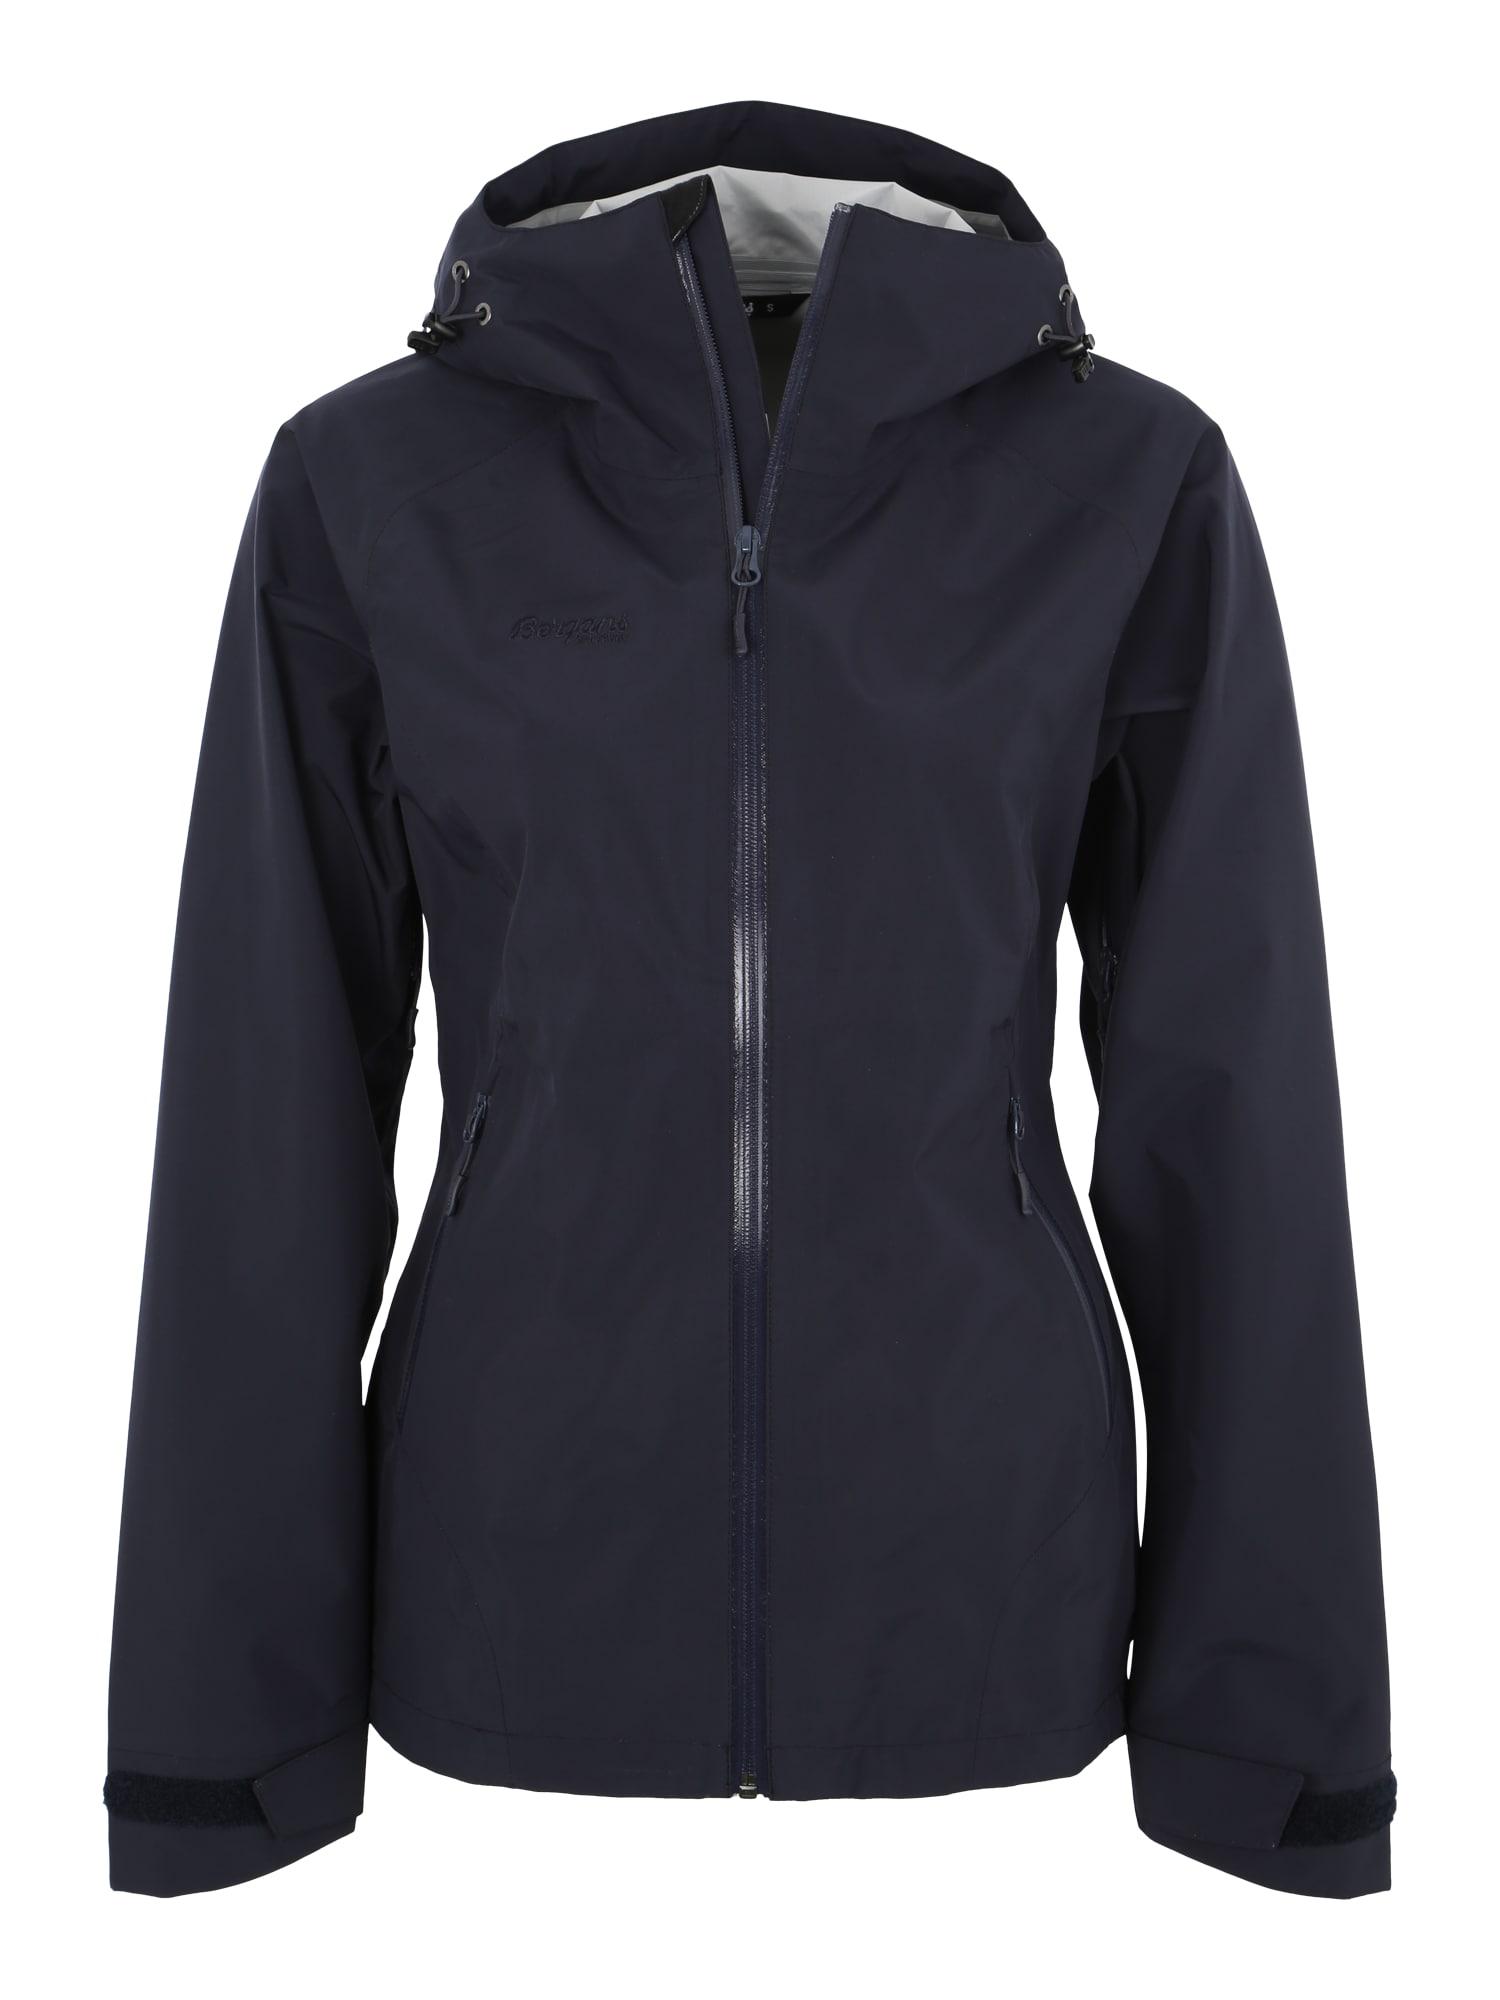 Outdoorová bunda Ramberg 3-Layer W tmavě modrá Bergans